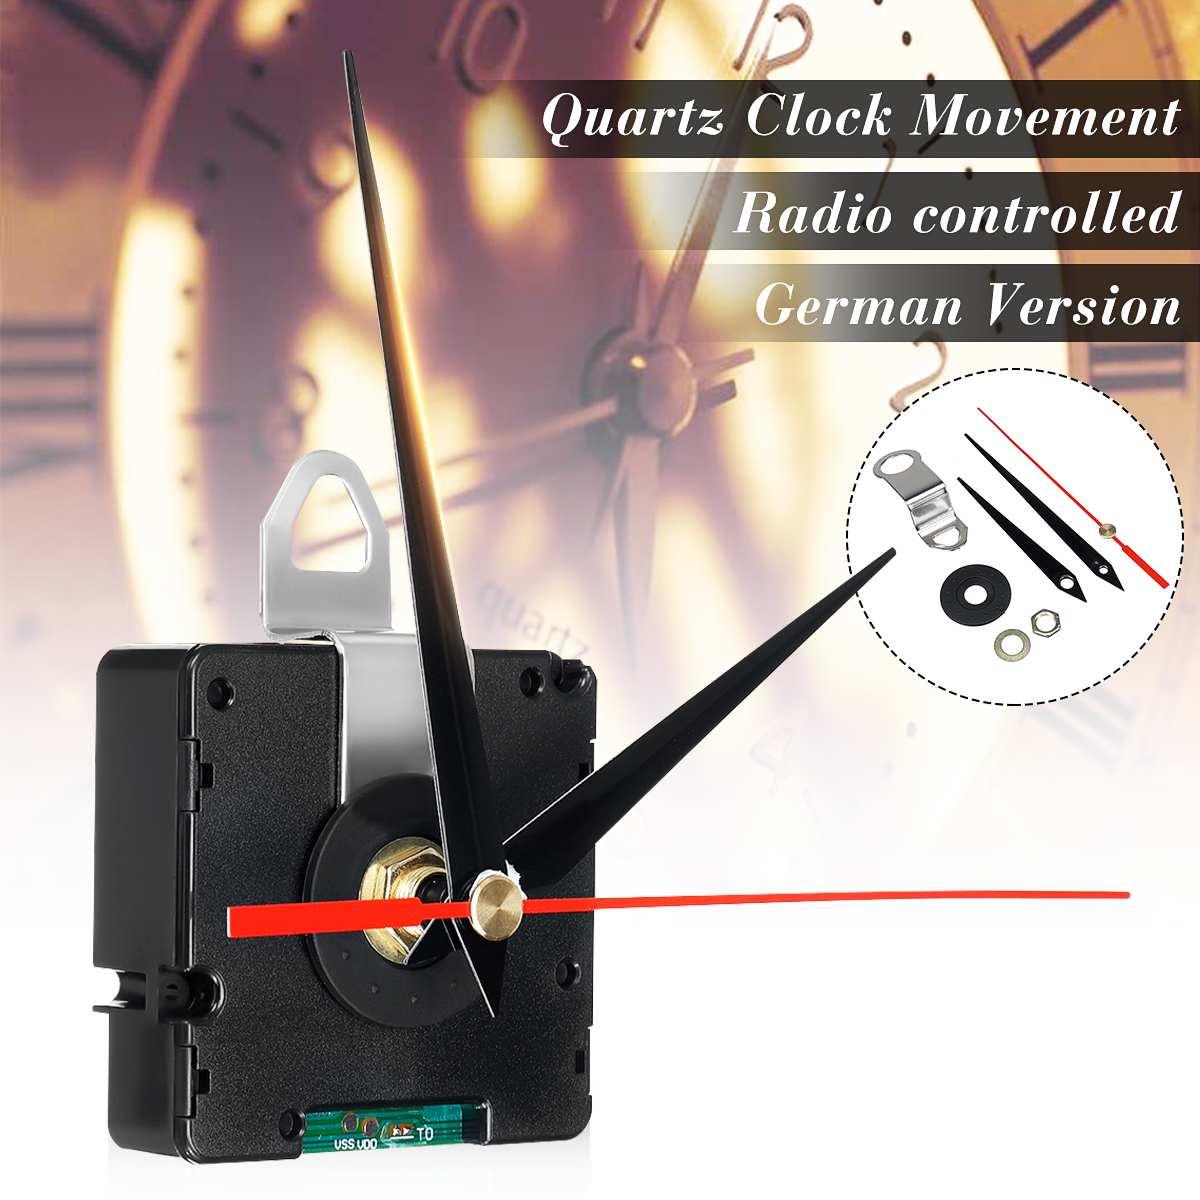 Atomic Radio Controlled Silent Clock Movement DIY Kit Germany DCF Signal HR9312 ModeAtomic Radio Controlled Silent Clock Movement DIY Kit Germany DCF Signal HR9312 Mode